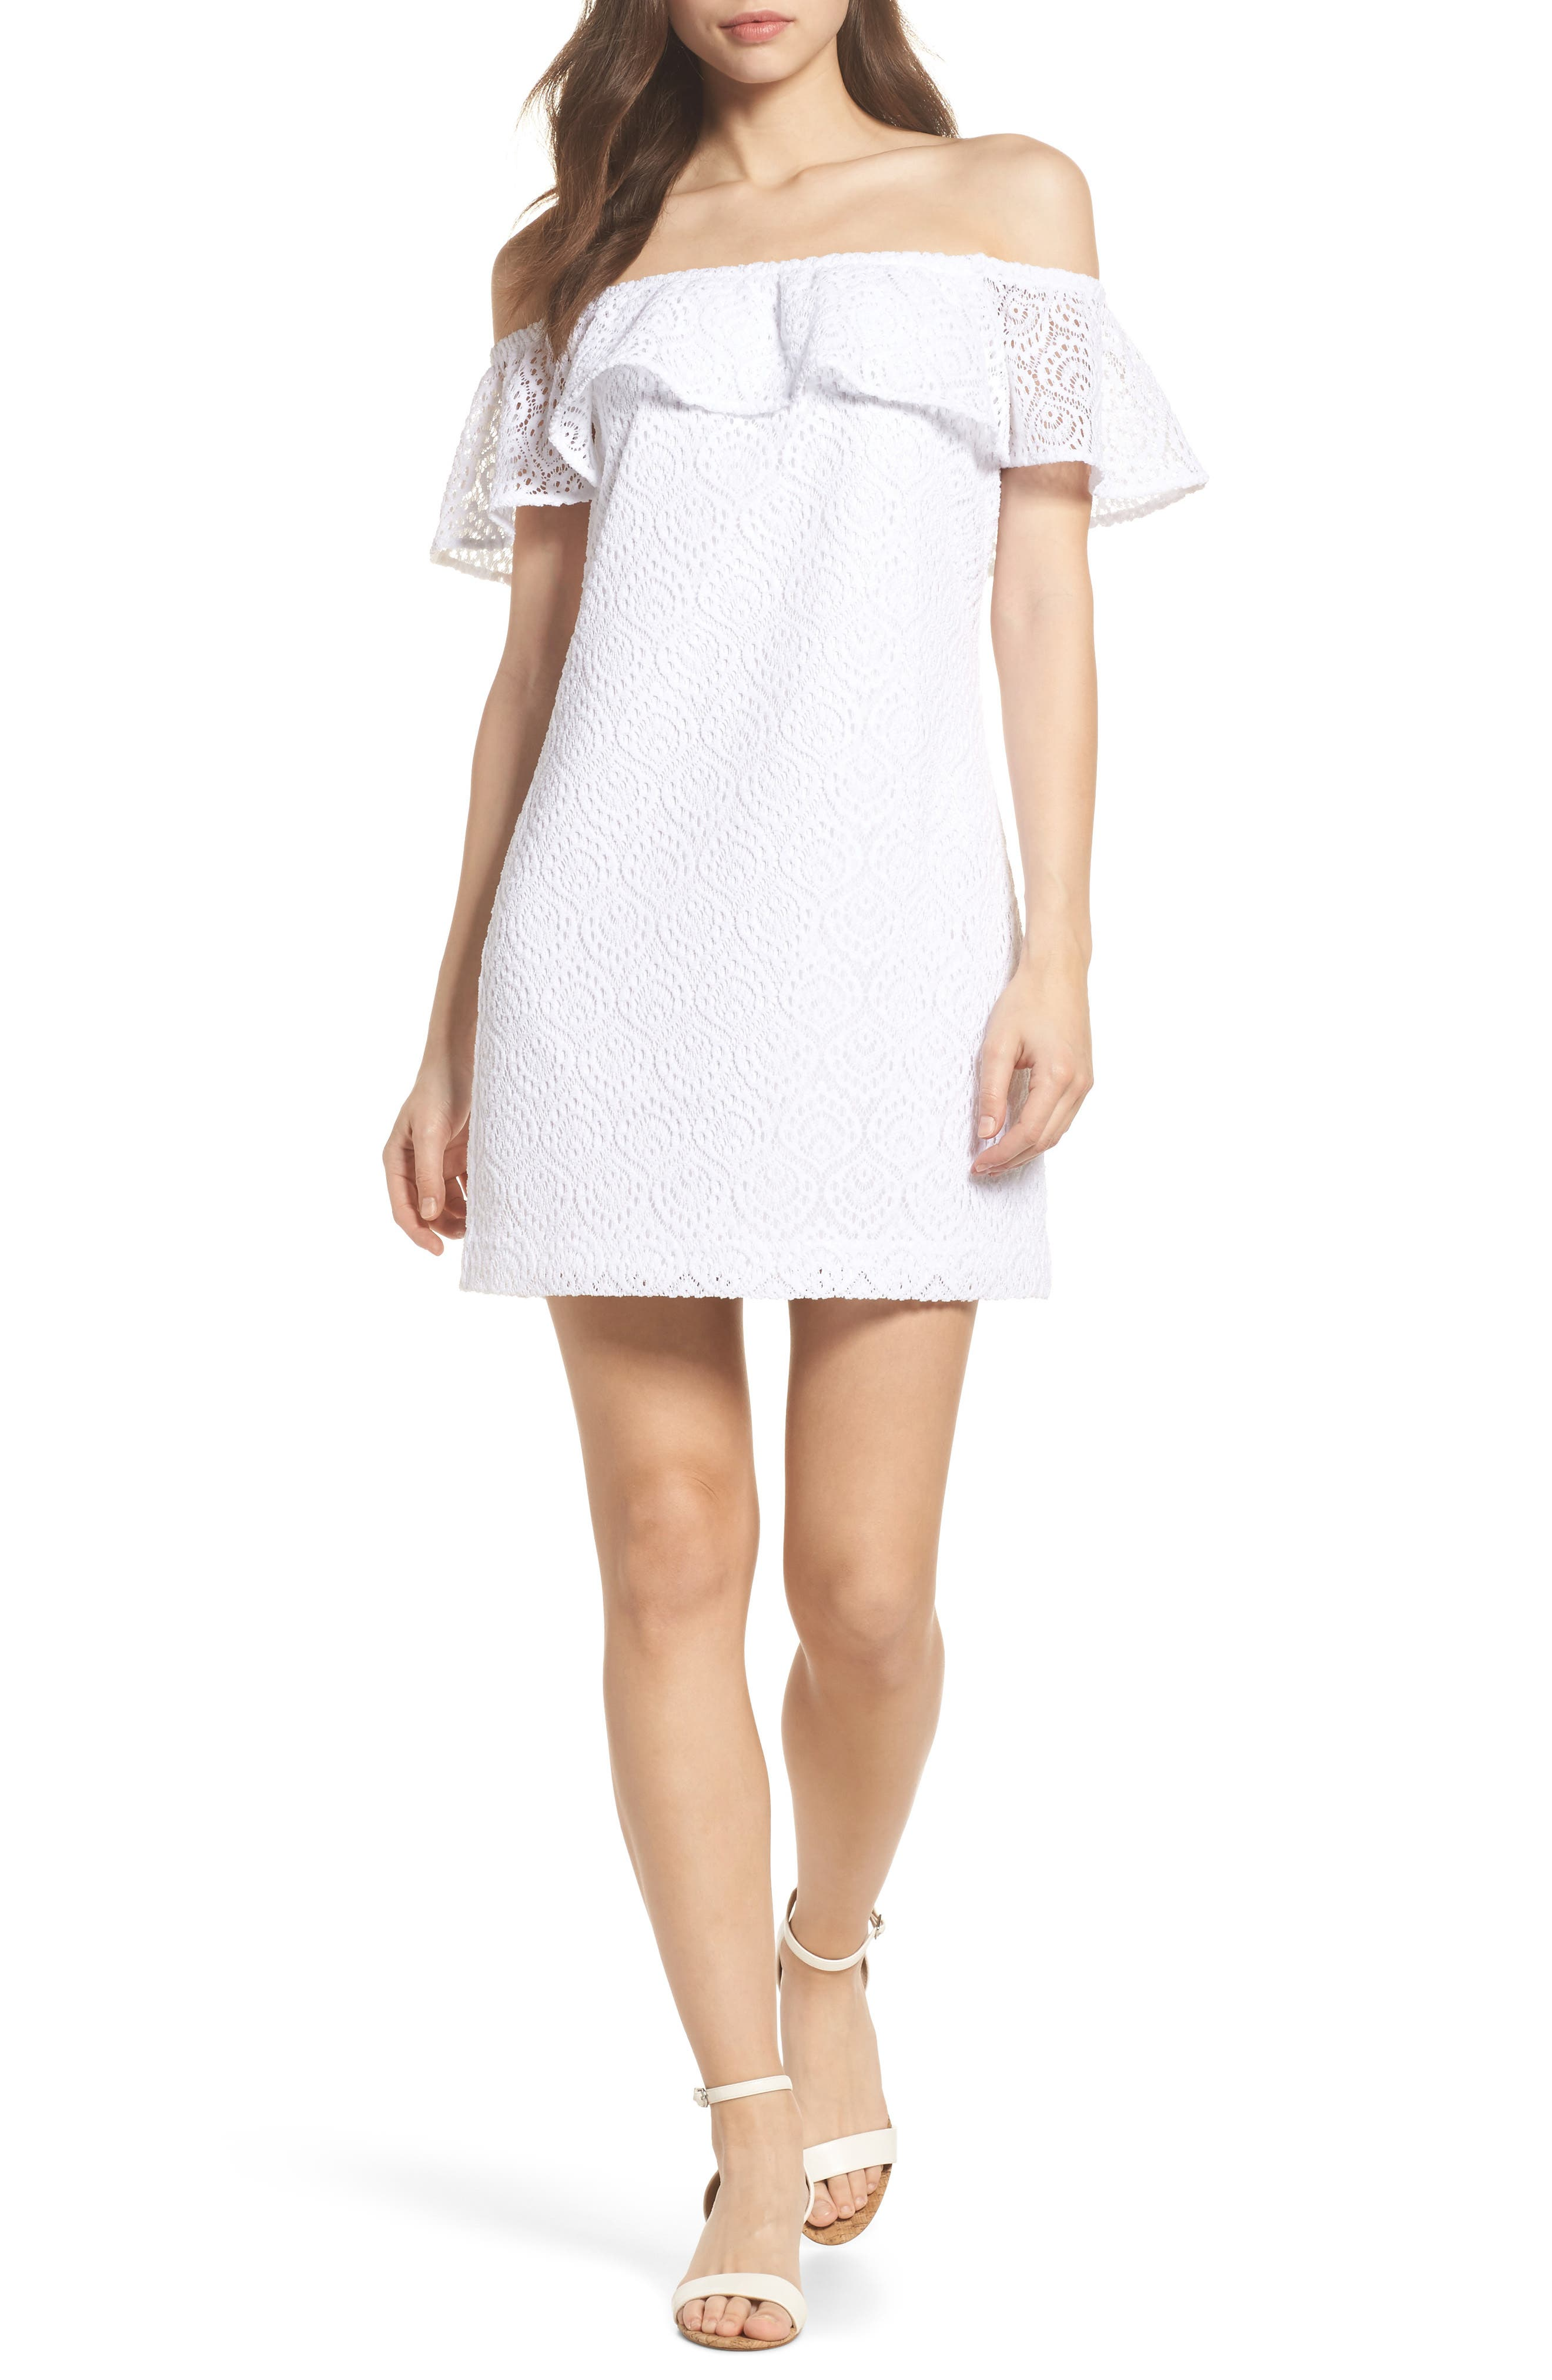 Lilly Pulitzer® La Fortuna Off the Shoulder Lace Dress